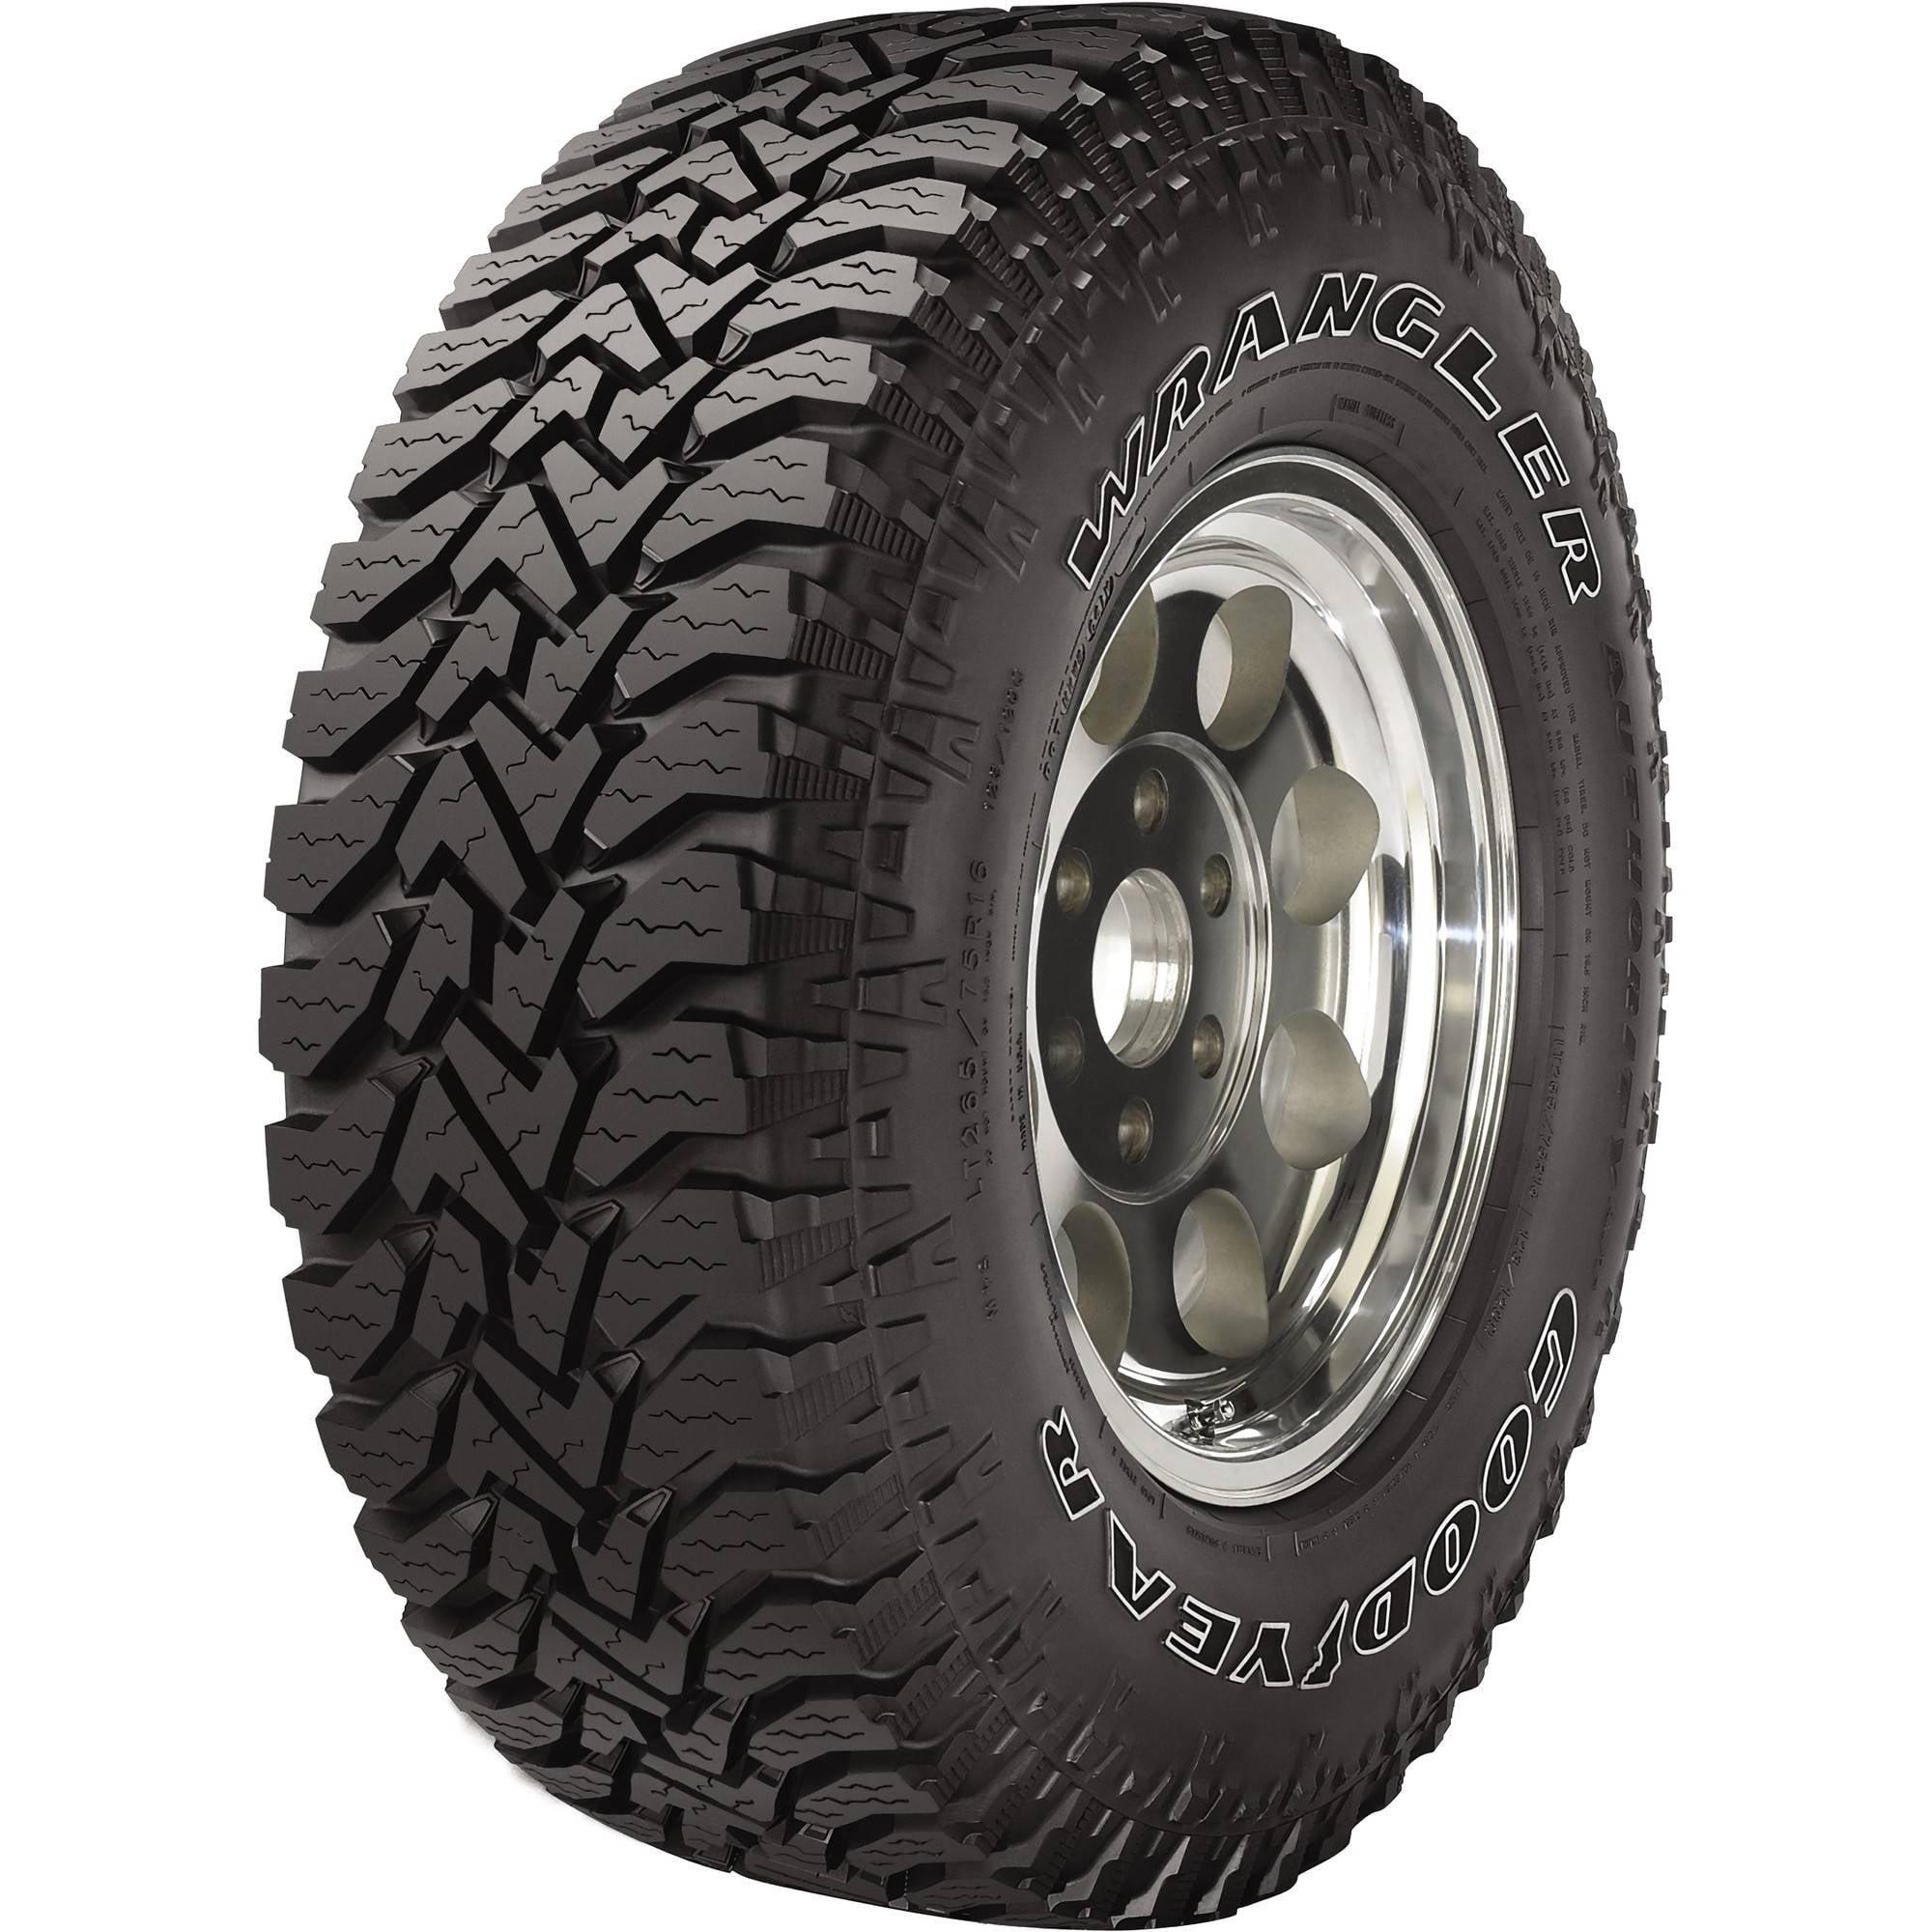 Goodyear Wrangler Authority Tire LT225/75R16